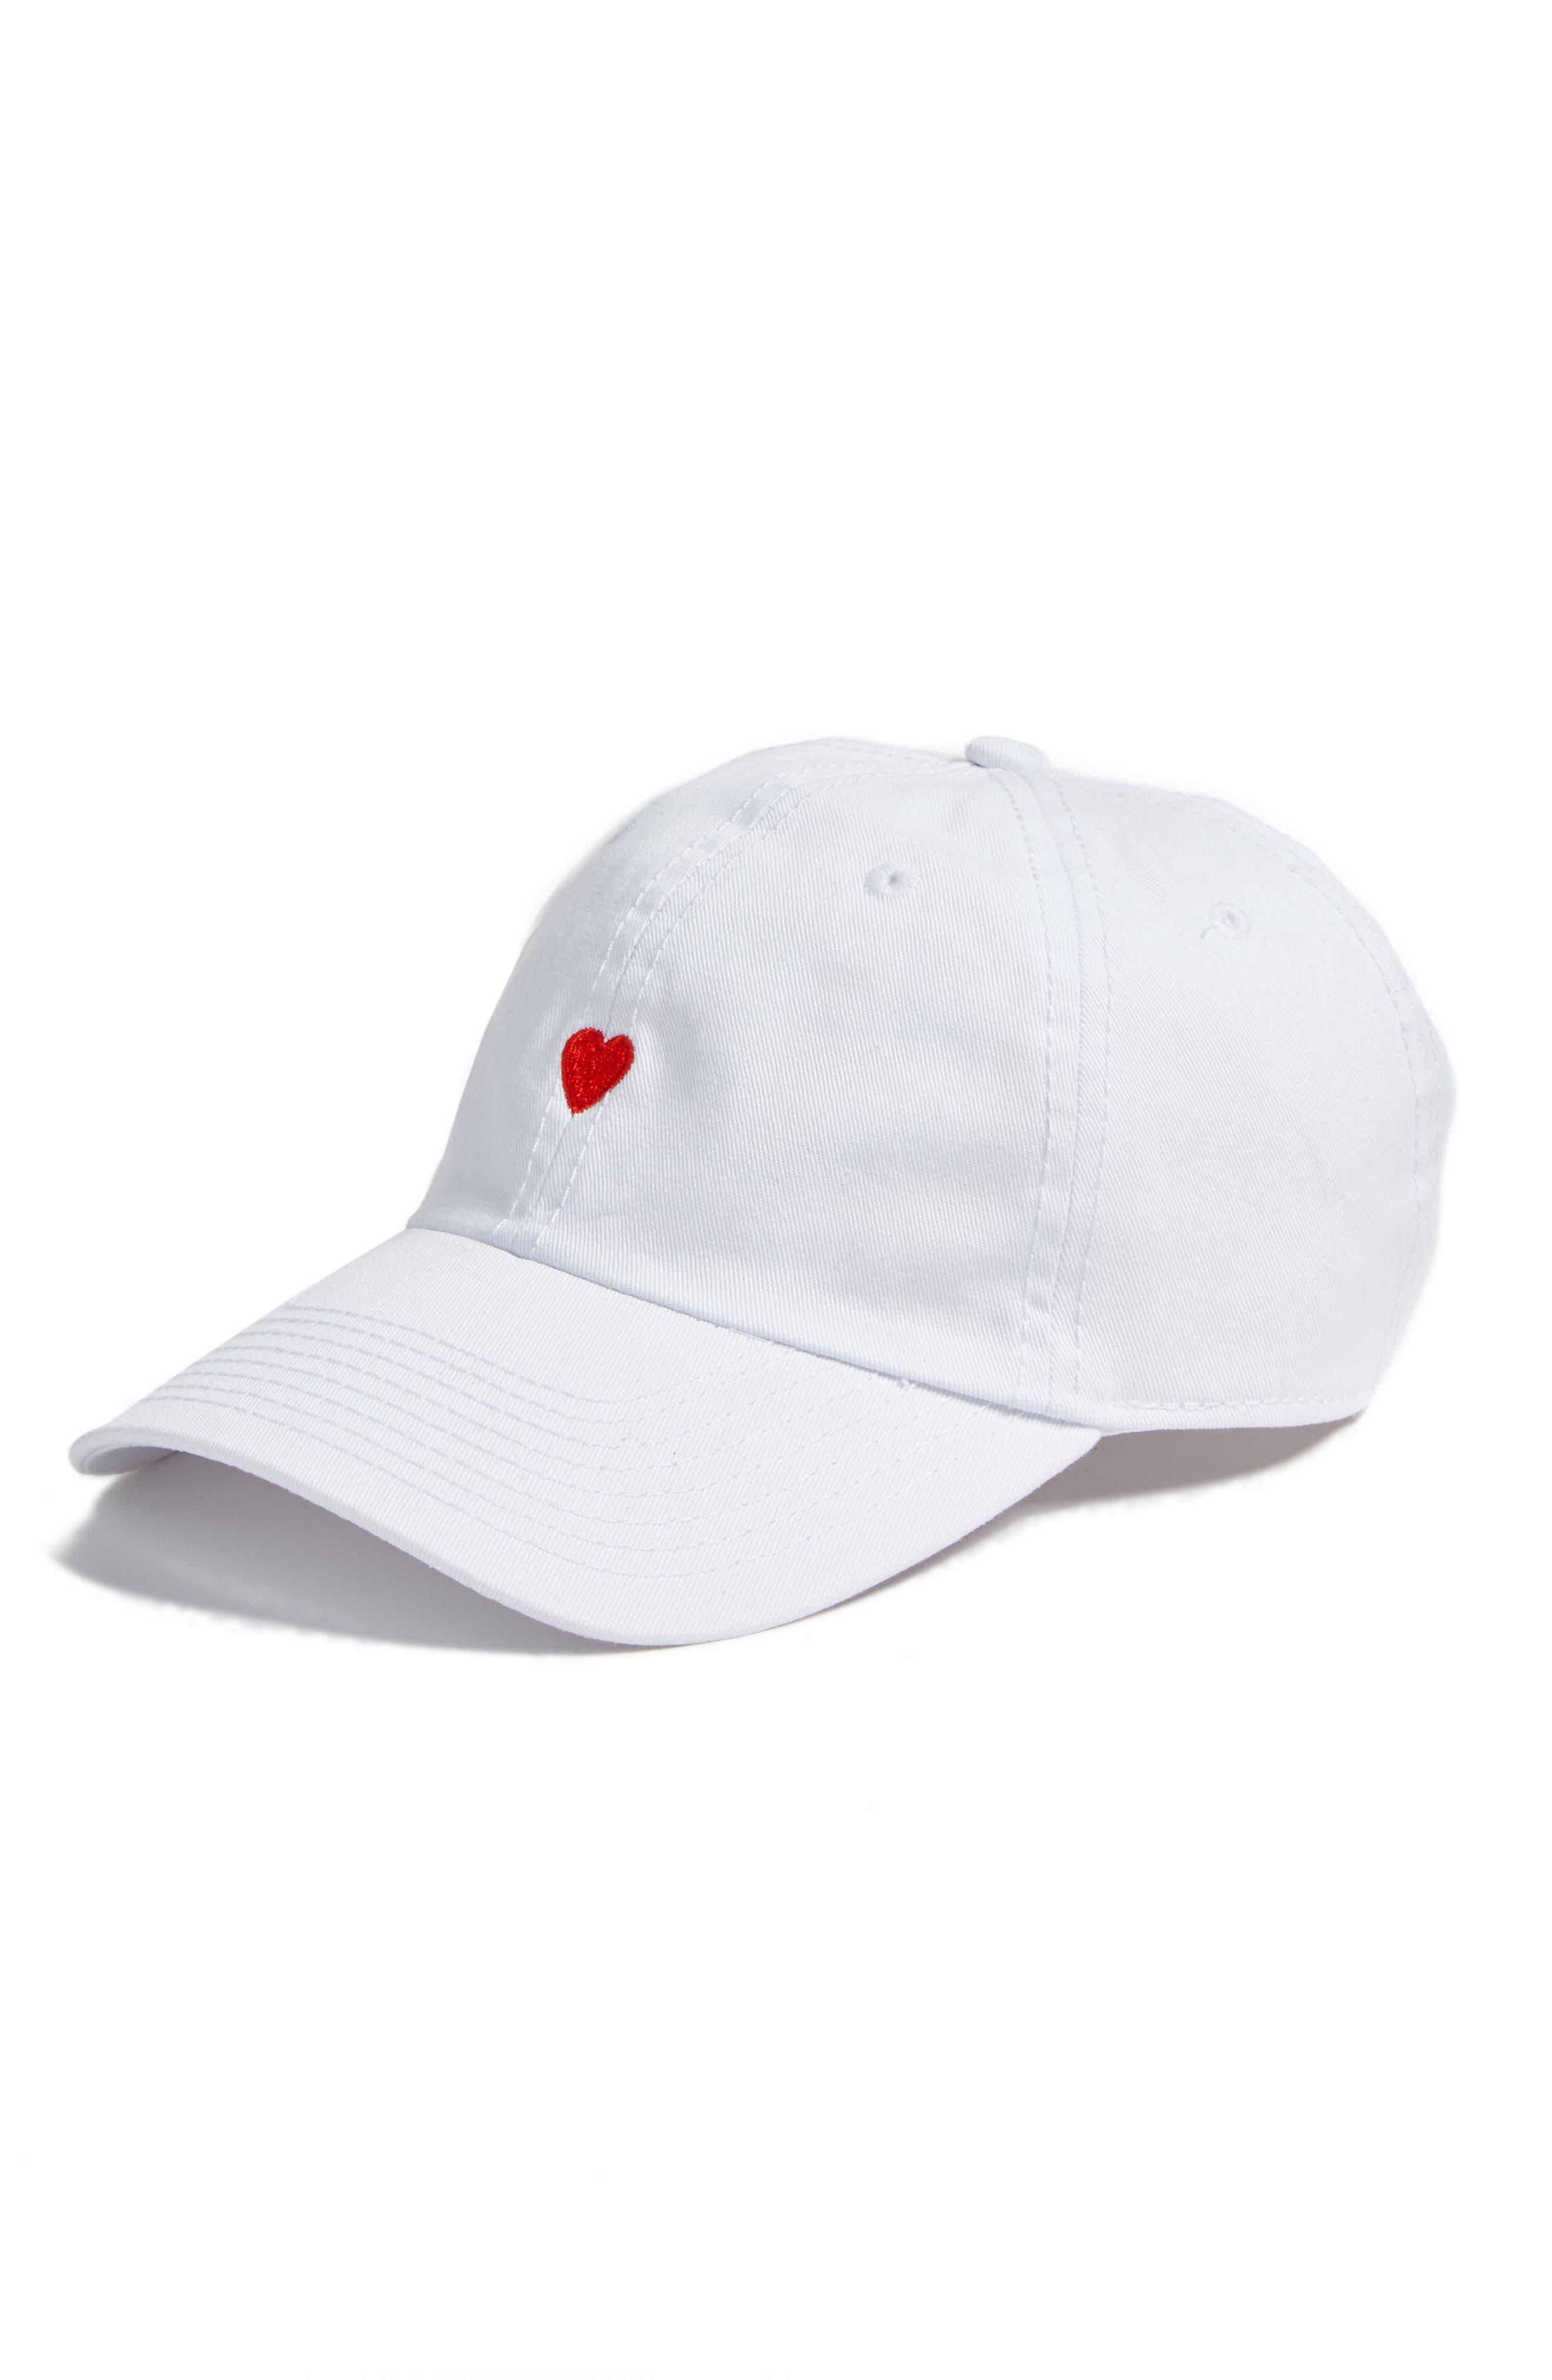 Micro Heart Baseball Cap,                             Main thumbnail 1, color,                             White